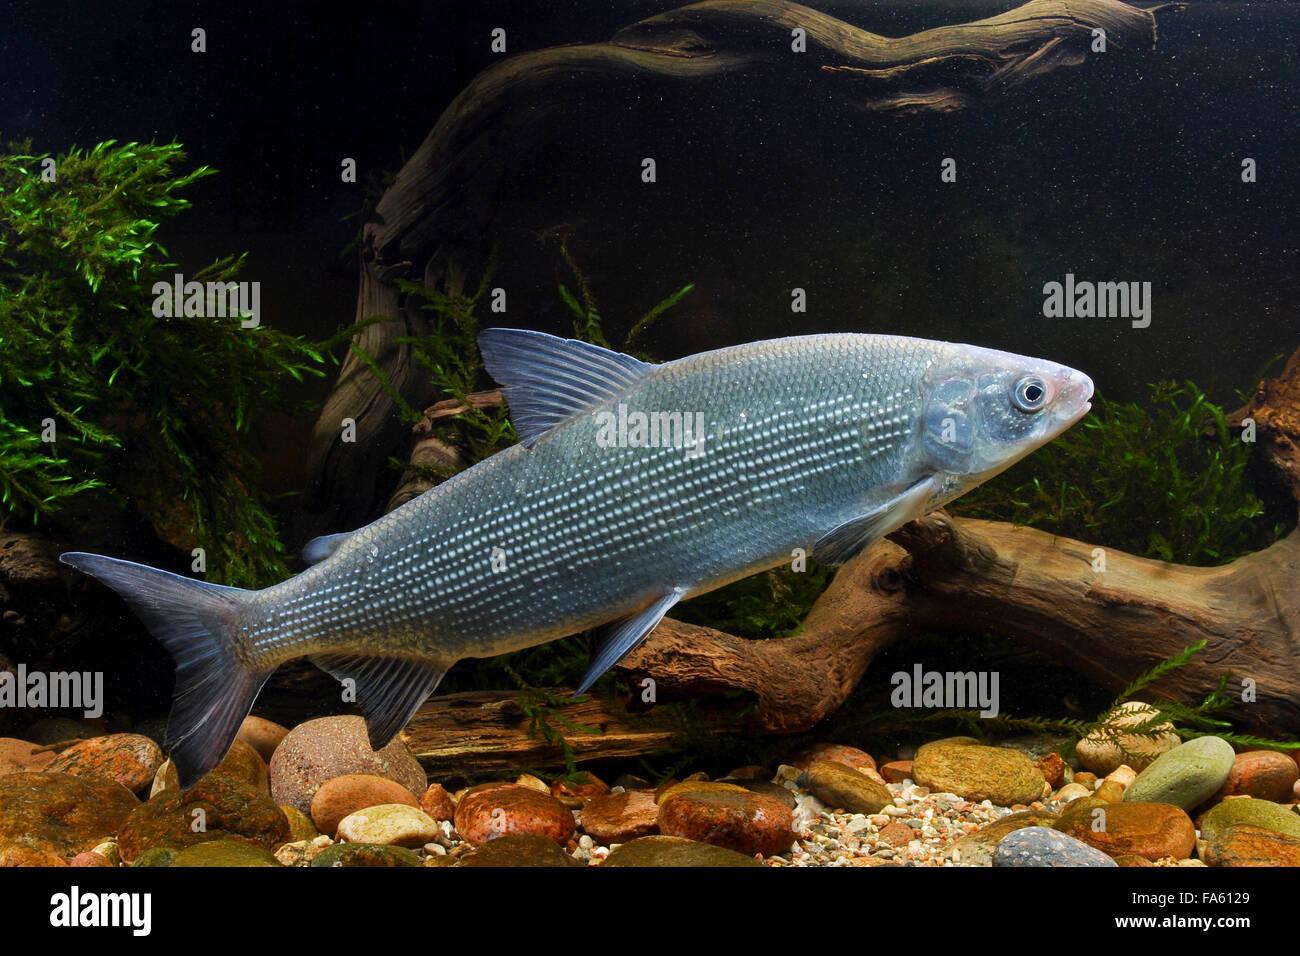 Excellent Freshwater Houting Powan Whitefish Groe Marne Groe Schwebrenke  Renke Kilch Coregonus Widegreni Coregonus Lavaretus With Groe